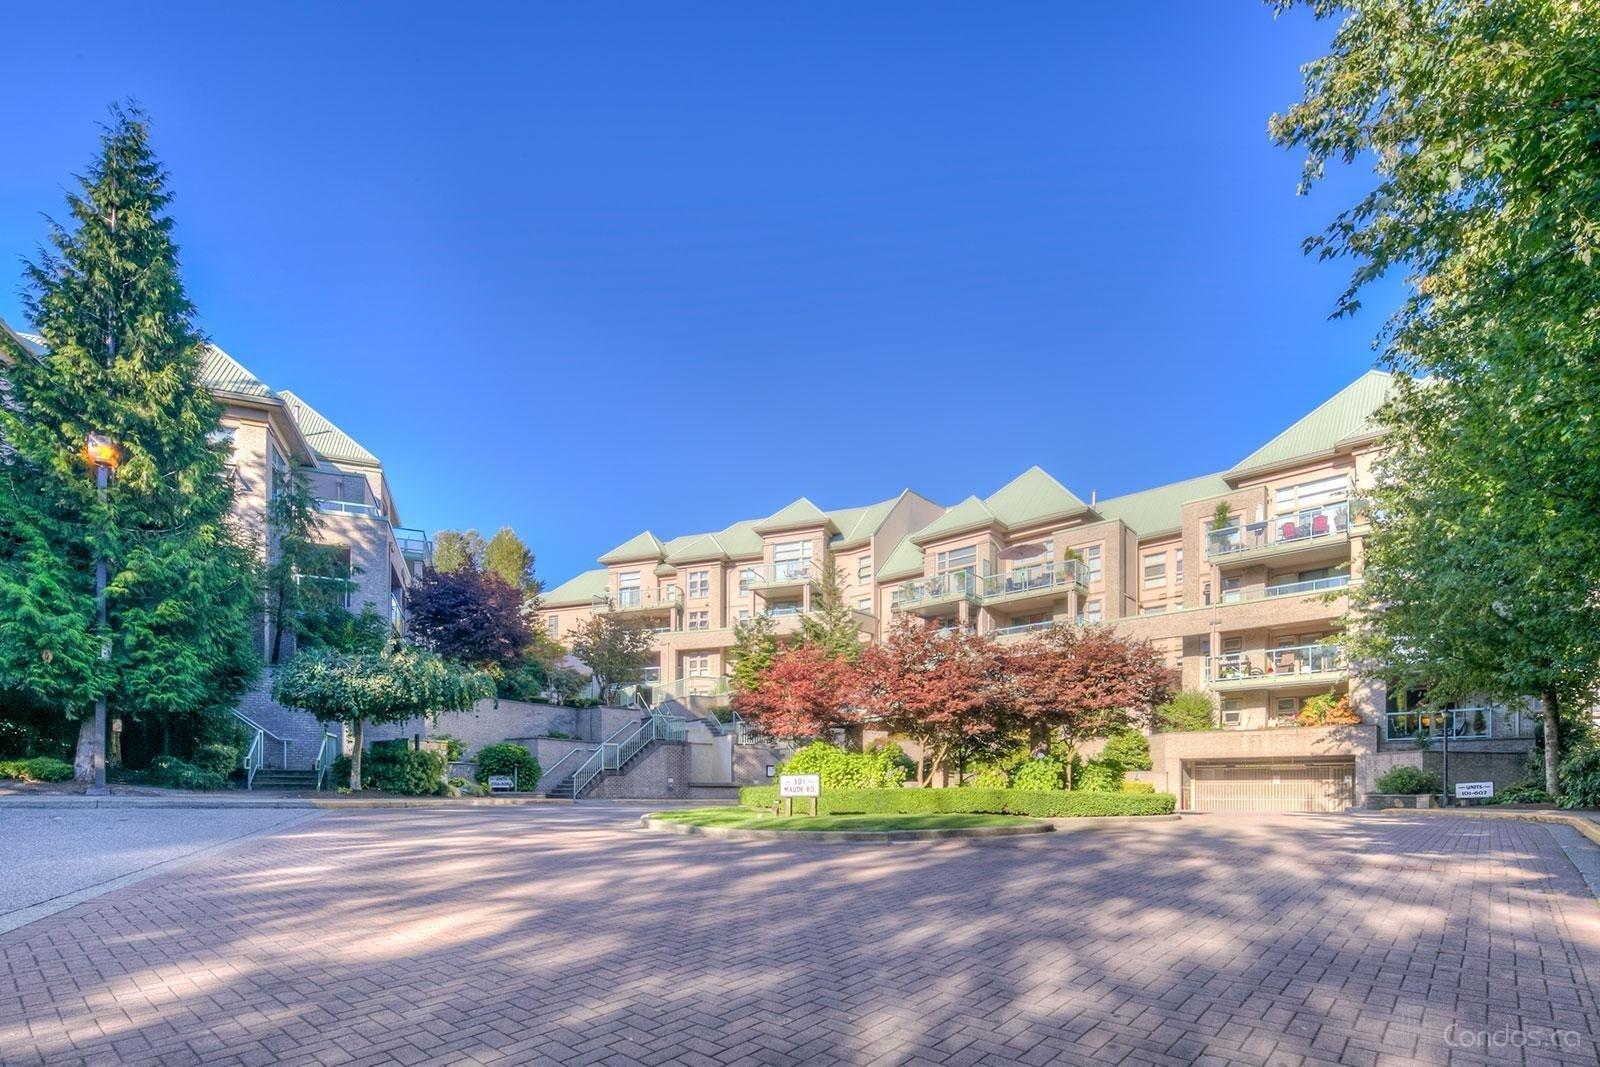 406A 301 MAUDE ROAD - North Shore Pt Moody Apartment/Condo for sale, 2 Bedrooms (R2624255)